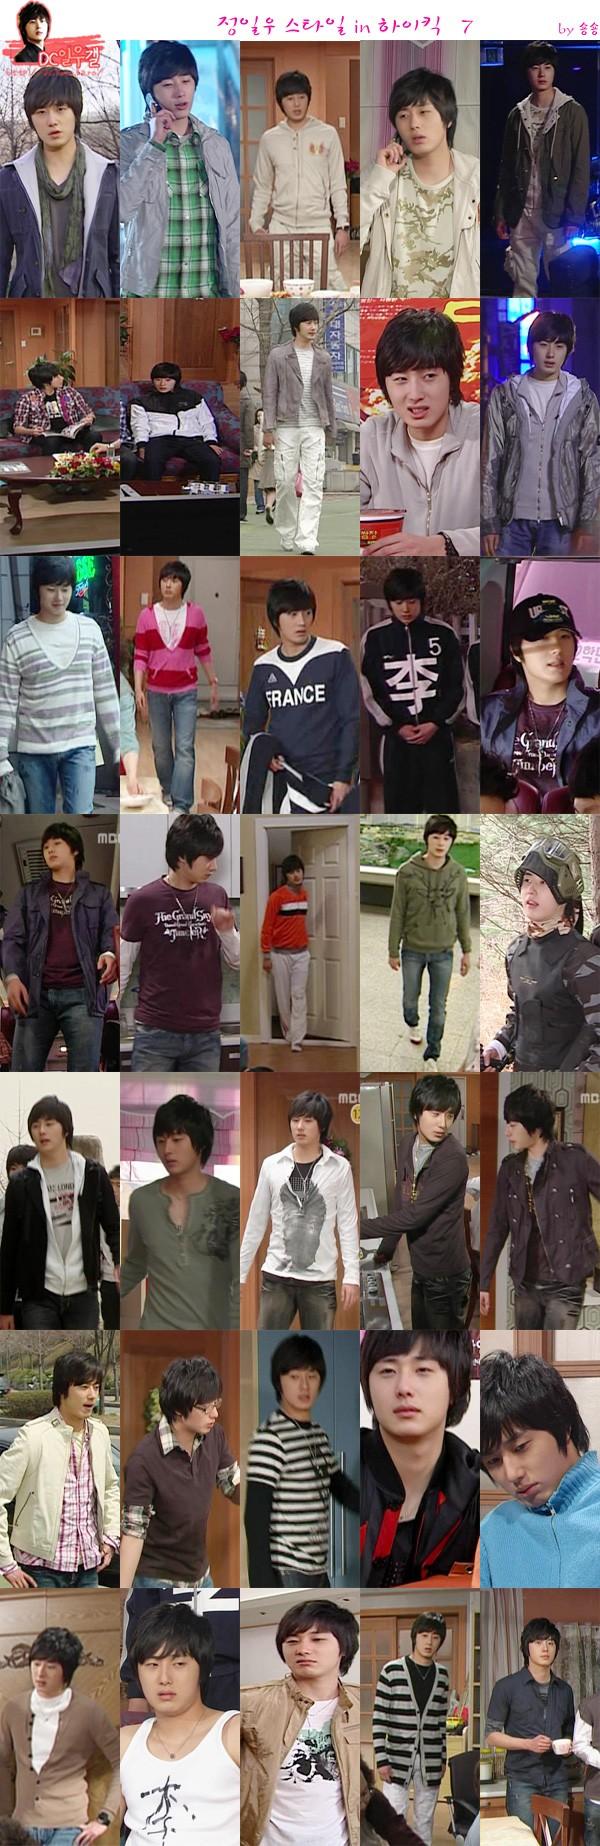 2007 JIW Collage 4.jpg